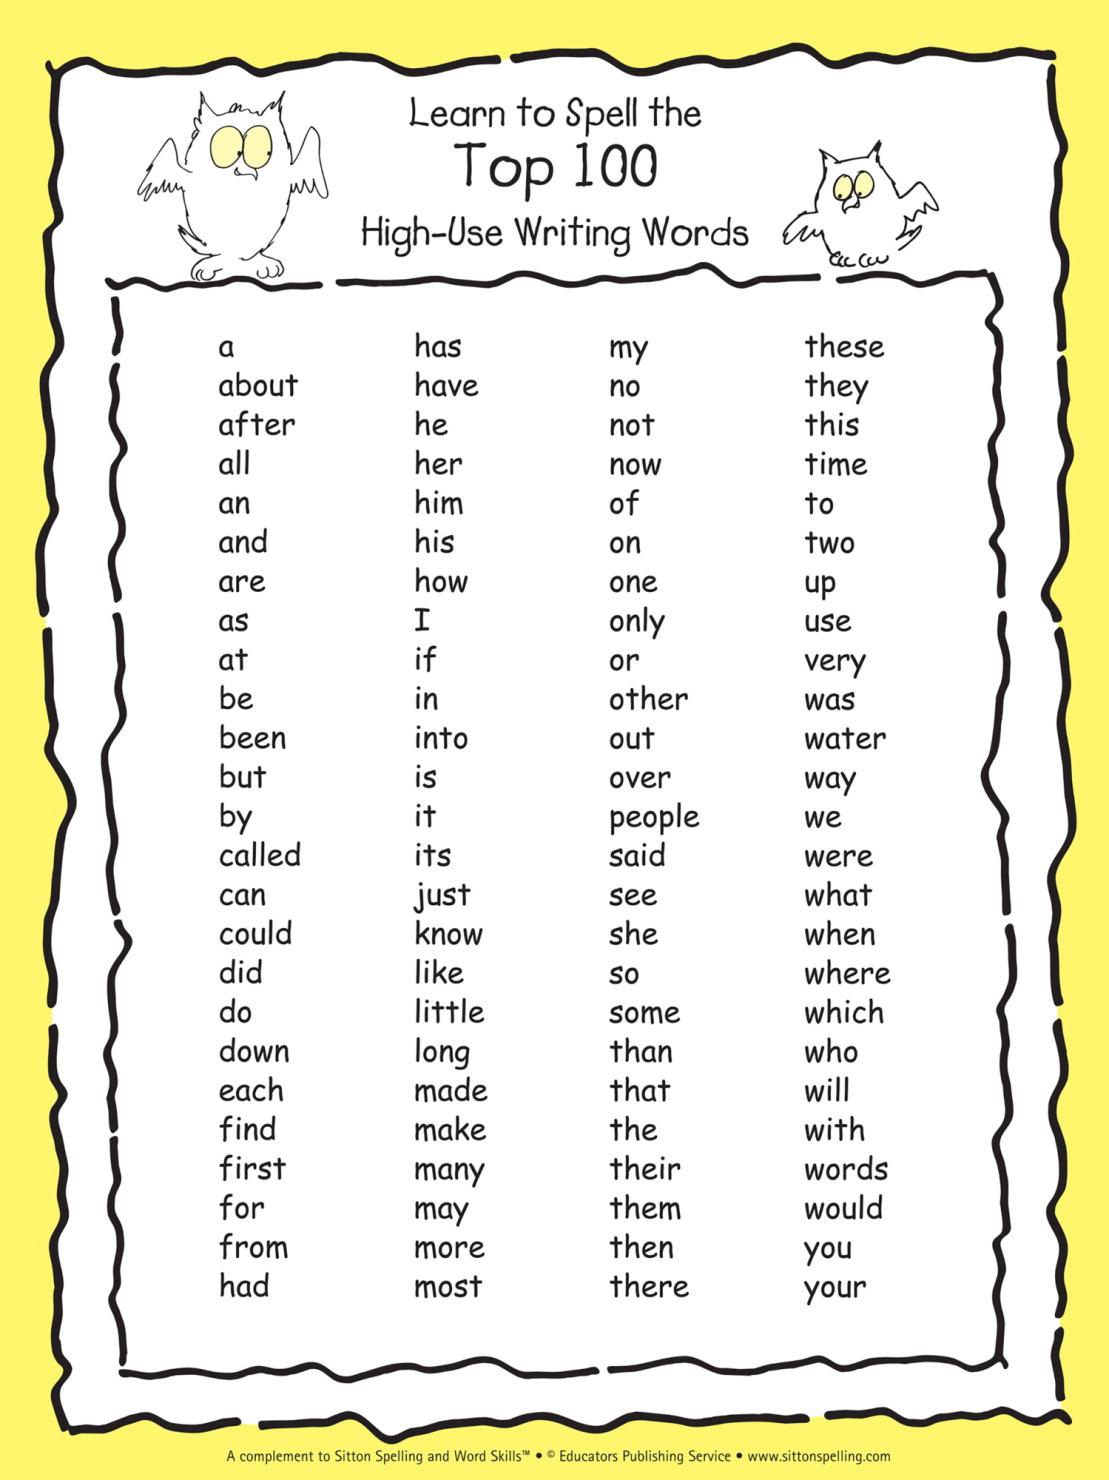 Sitton Spelling Top 100 Words, Set of 5